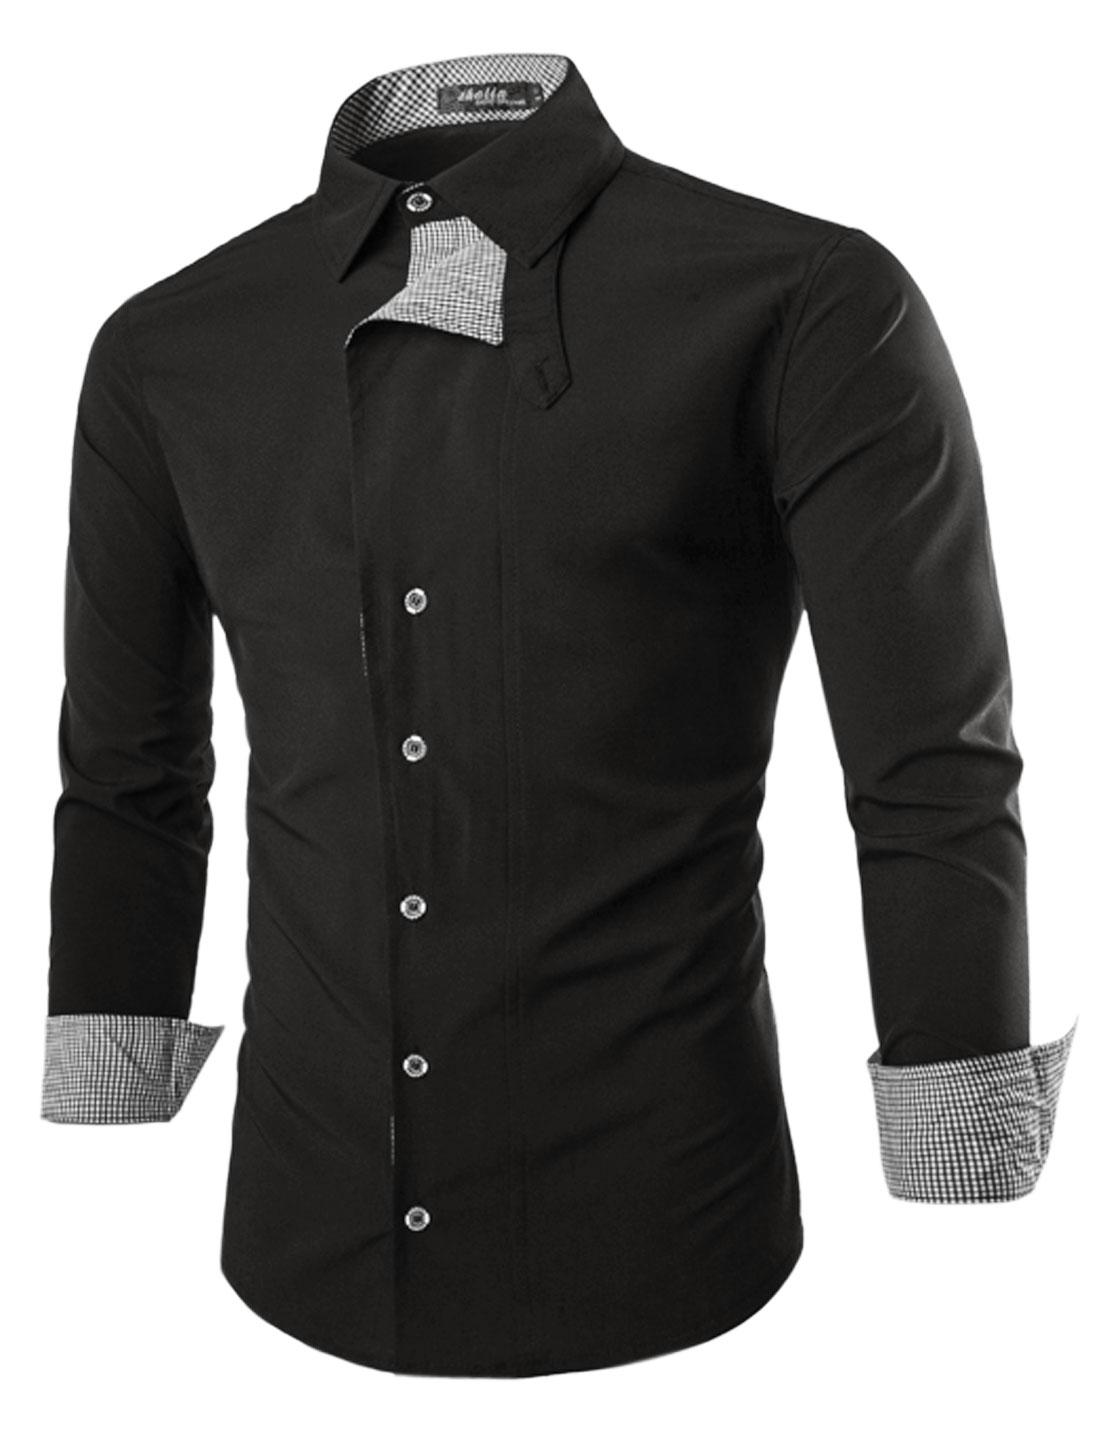 Men Long Sleeve Point Collar Slim Fit Button Down Layered Shirt Black M